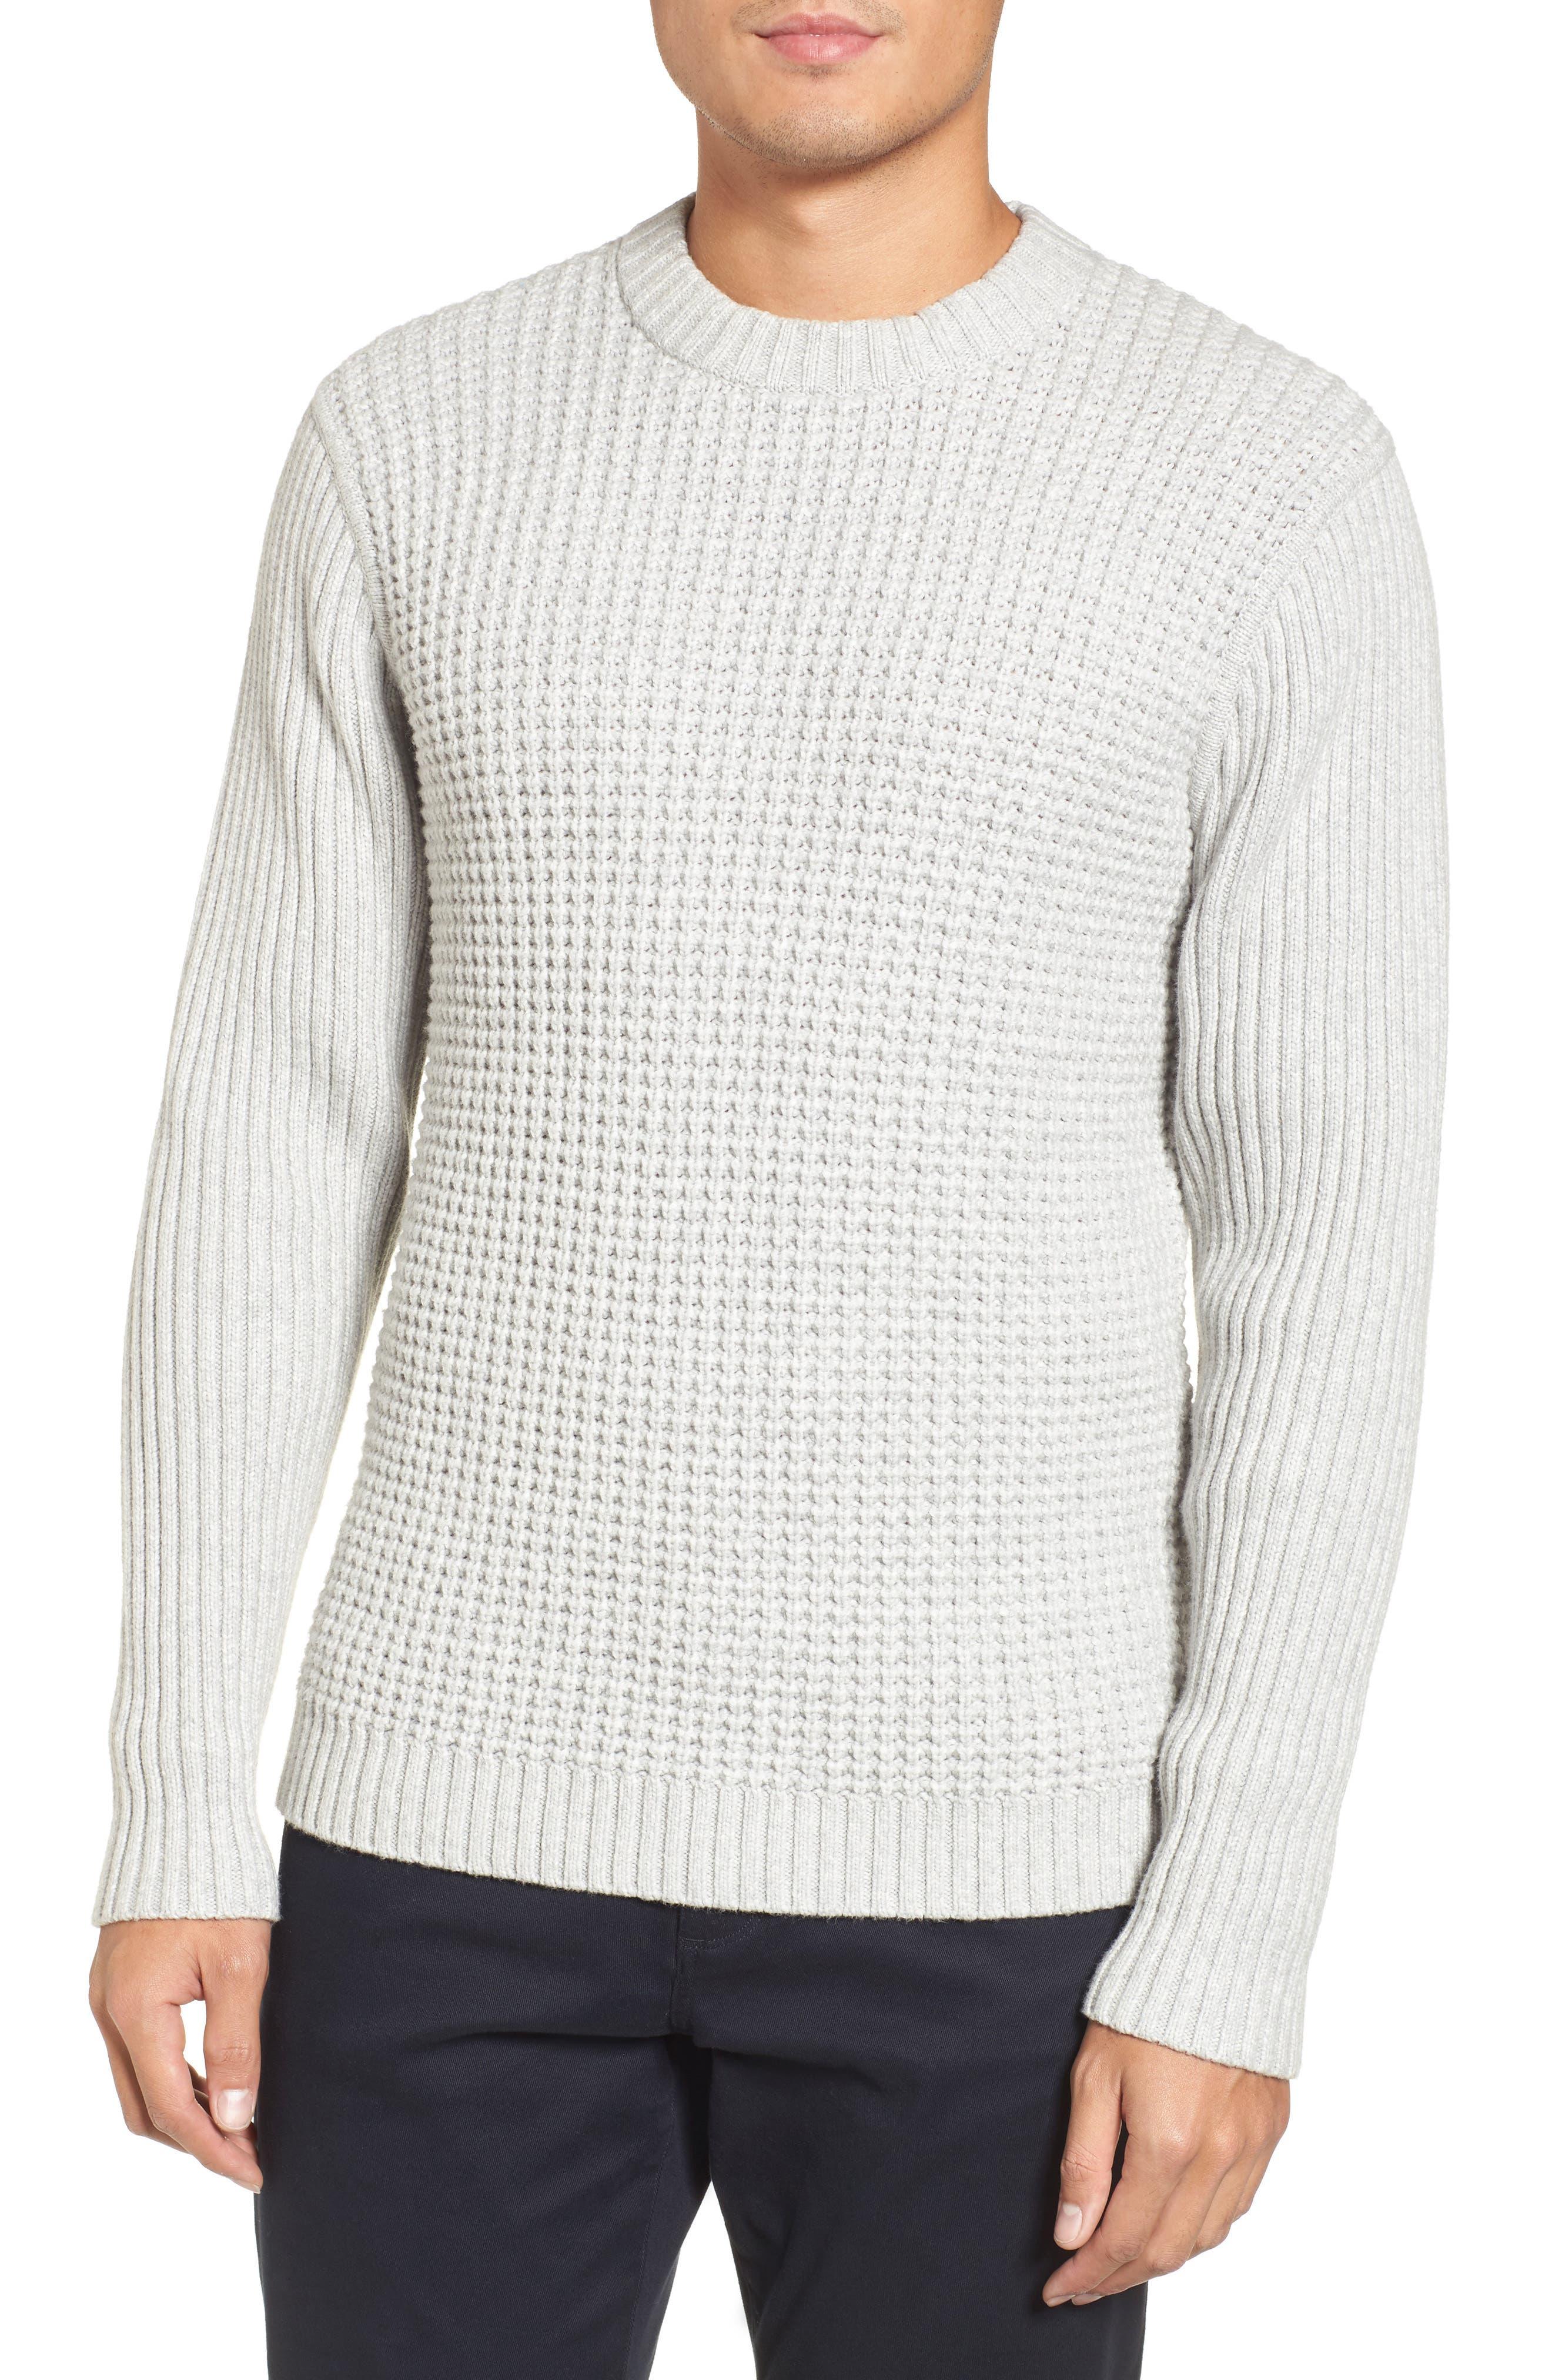 Main Image - Calibrate Heavyweight Mixed Knit Crewneck Sweater